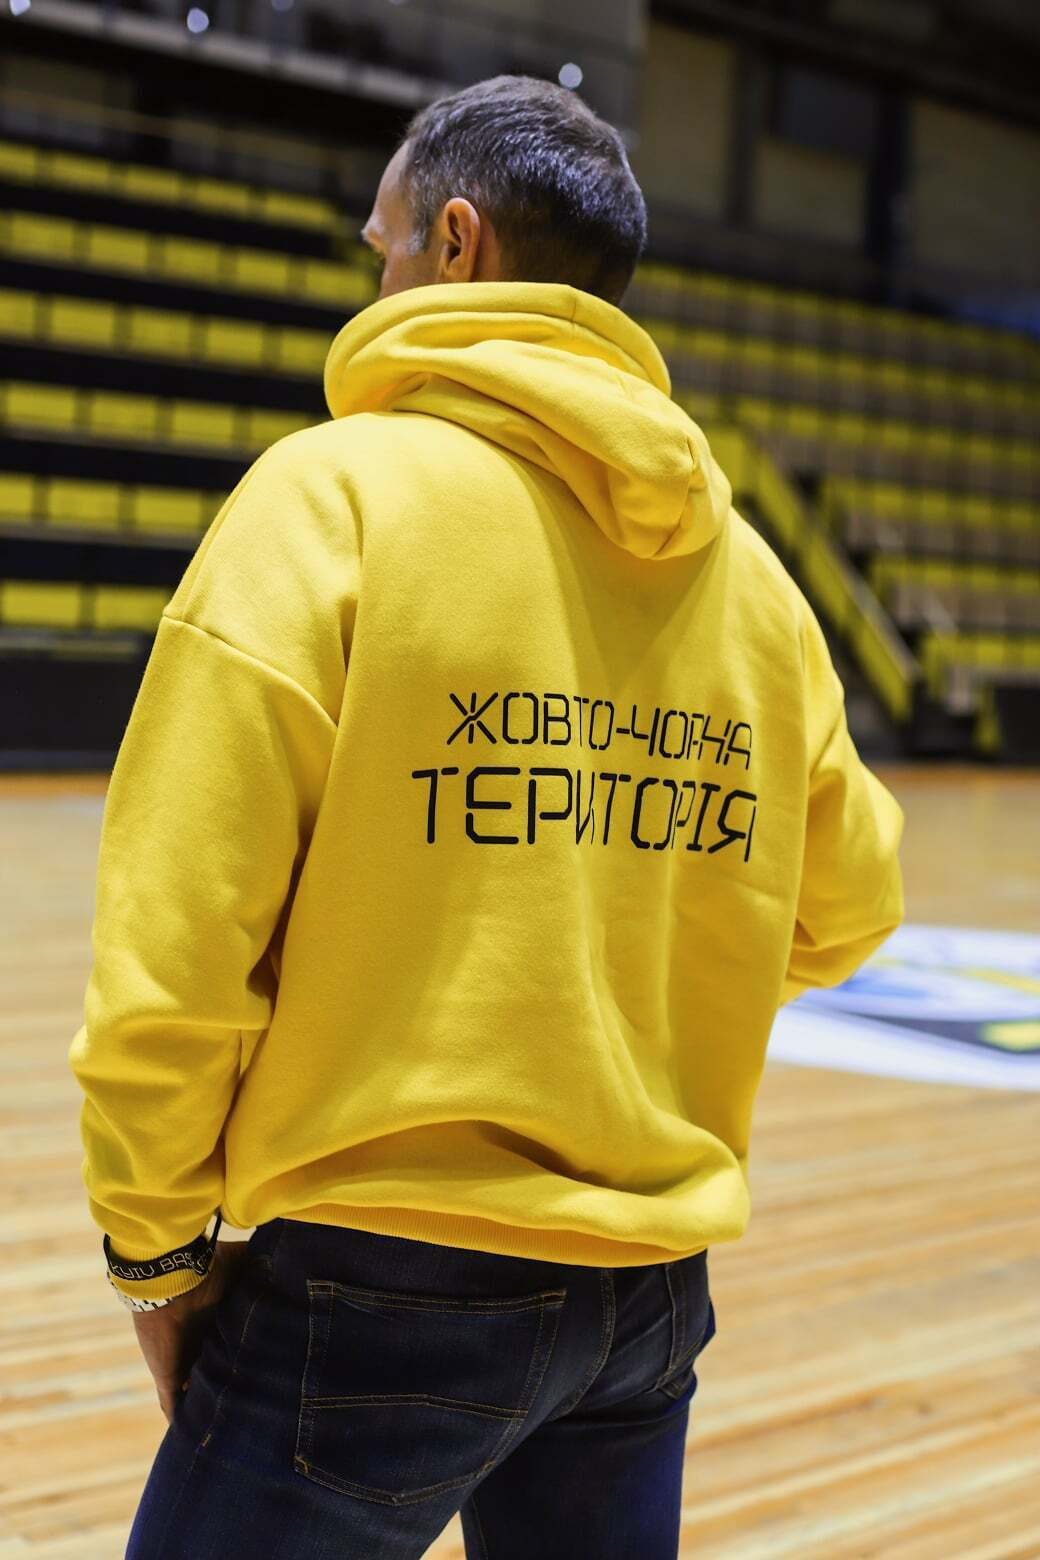 """Київ-Баскет"" представив нову колекцію фанатської одягу за участю Айнарса Багатскіса"